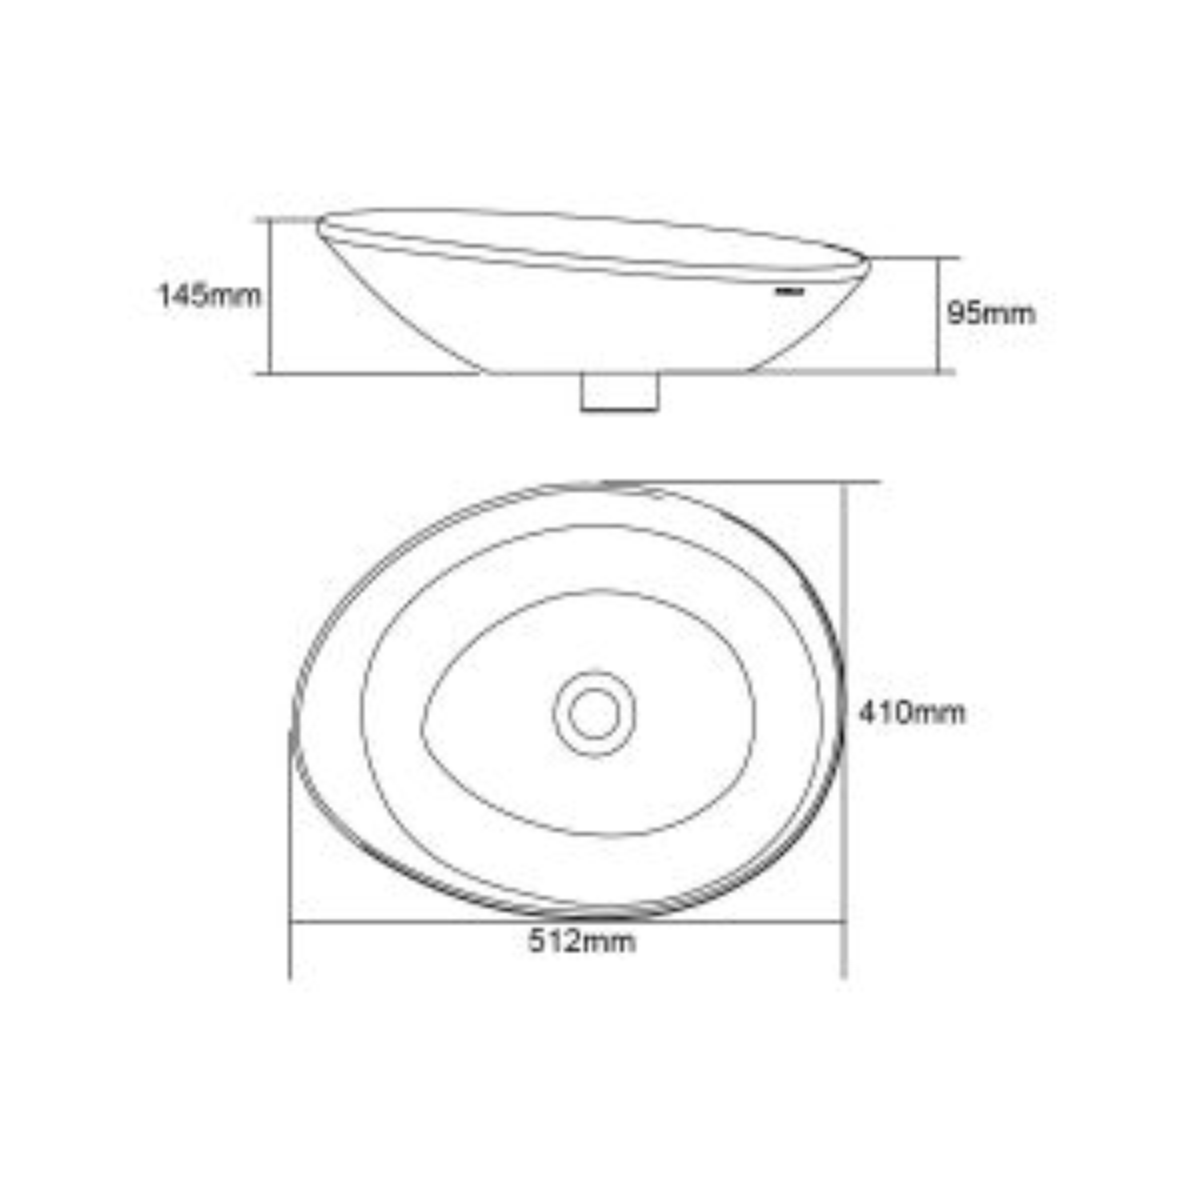 Frontline Galaxy Countertop Basin Drawing